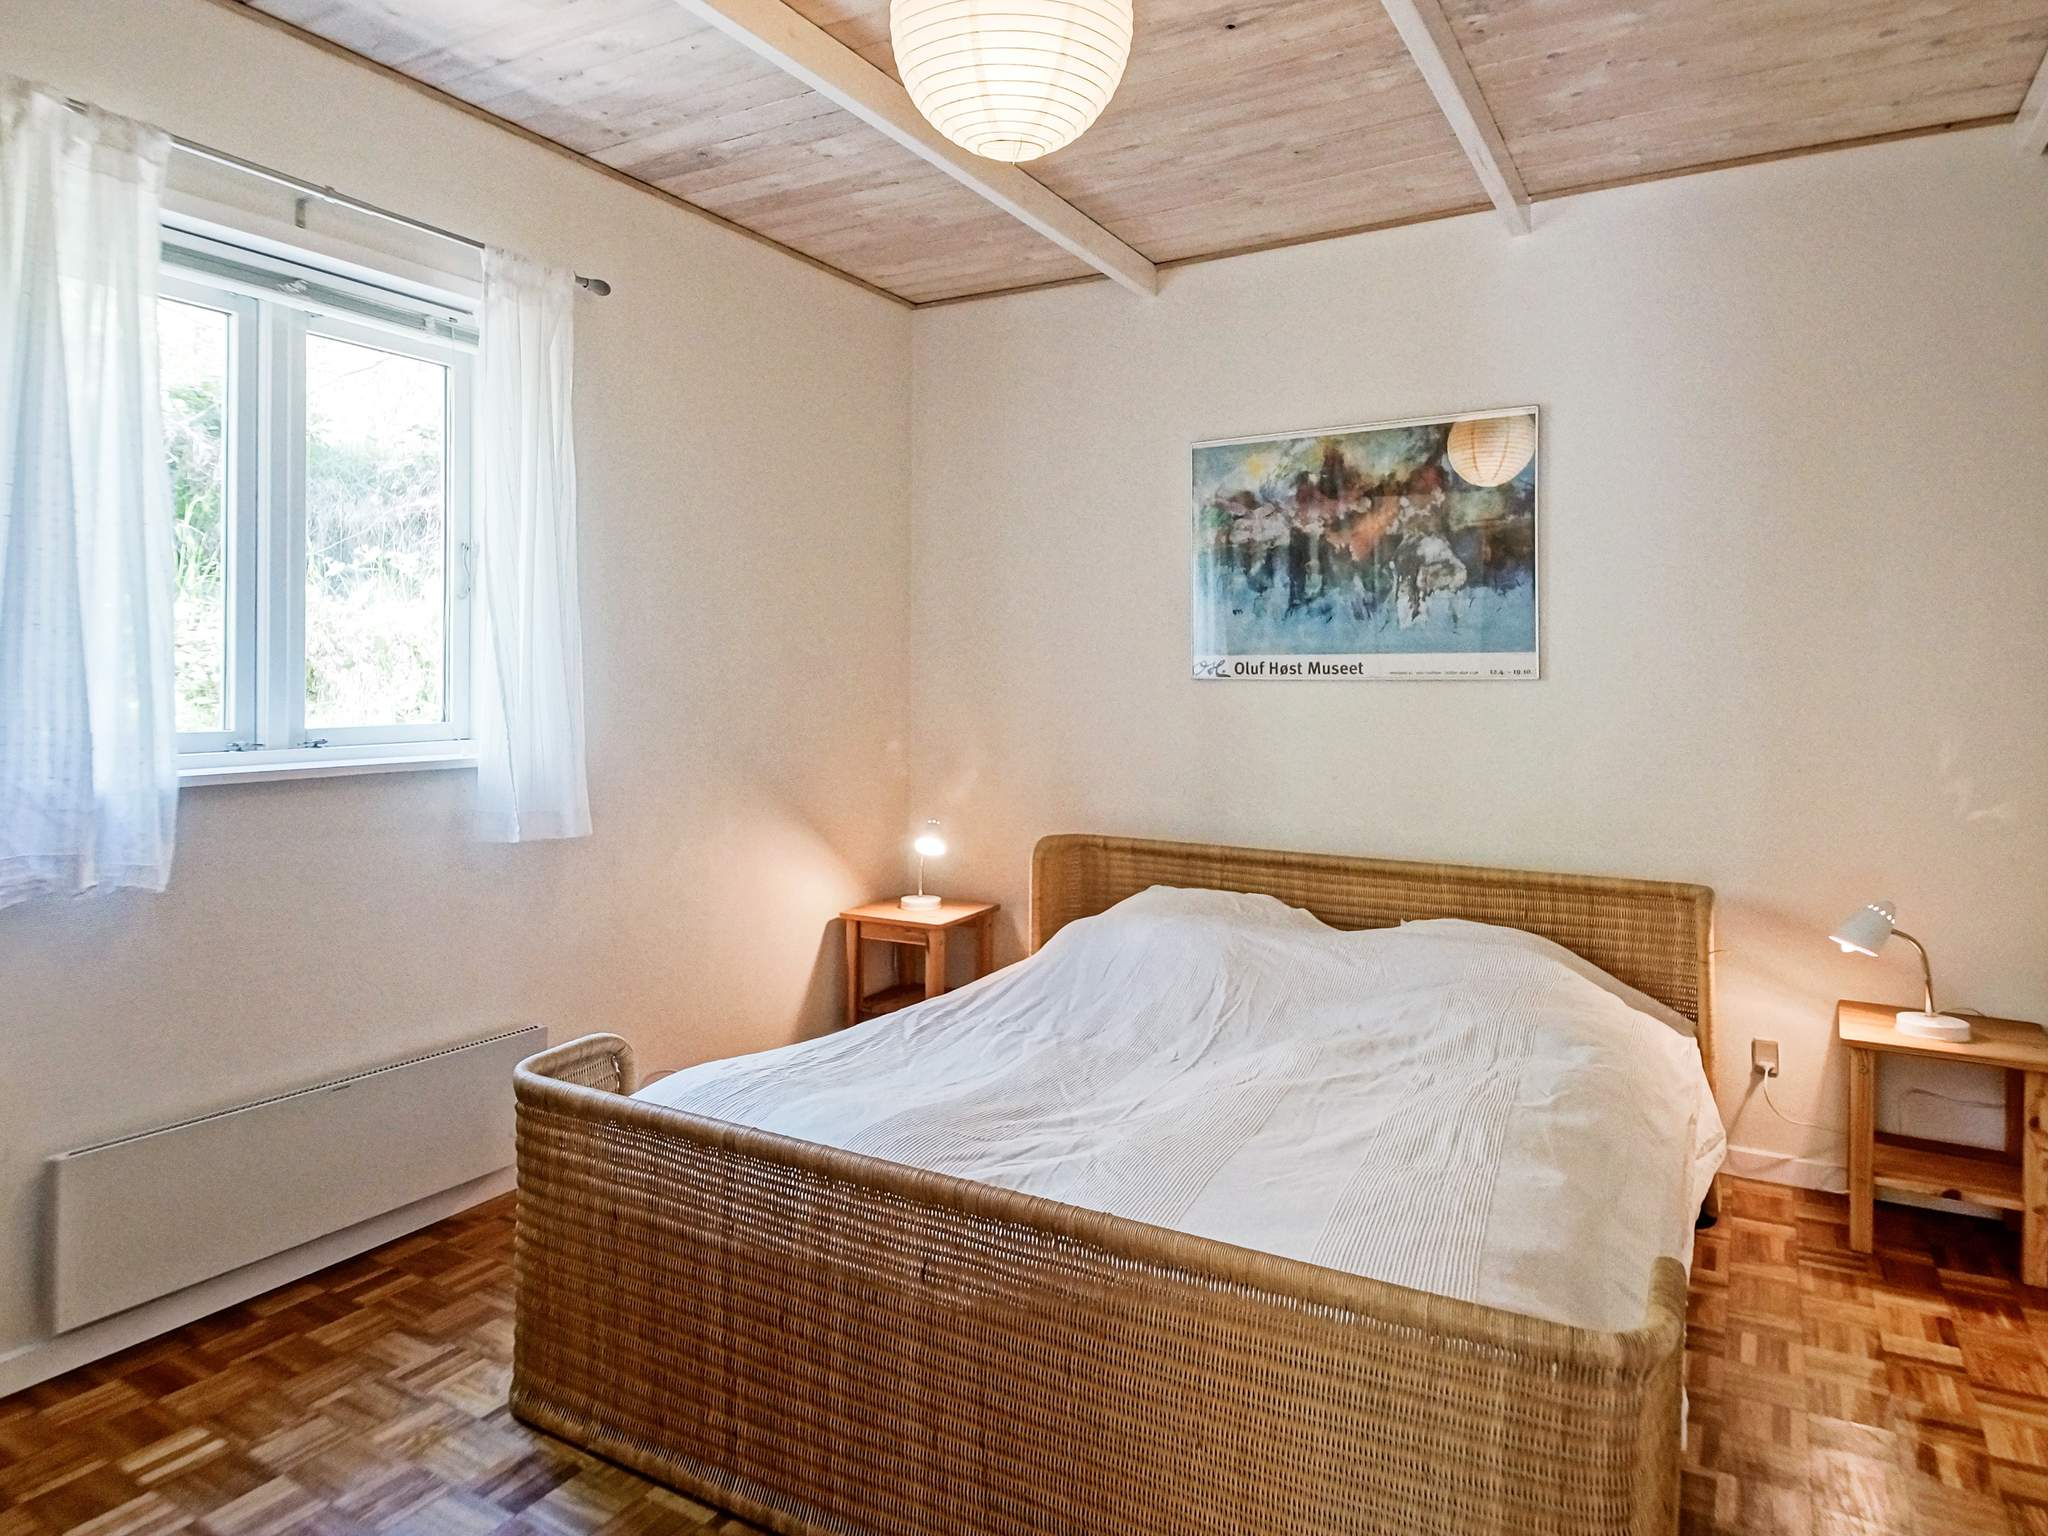 Ferienhaus Balka Strand (82258), Balke, , Bornholm, Dänemark, Bild 8